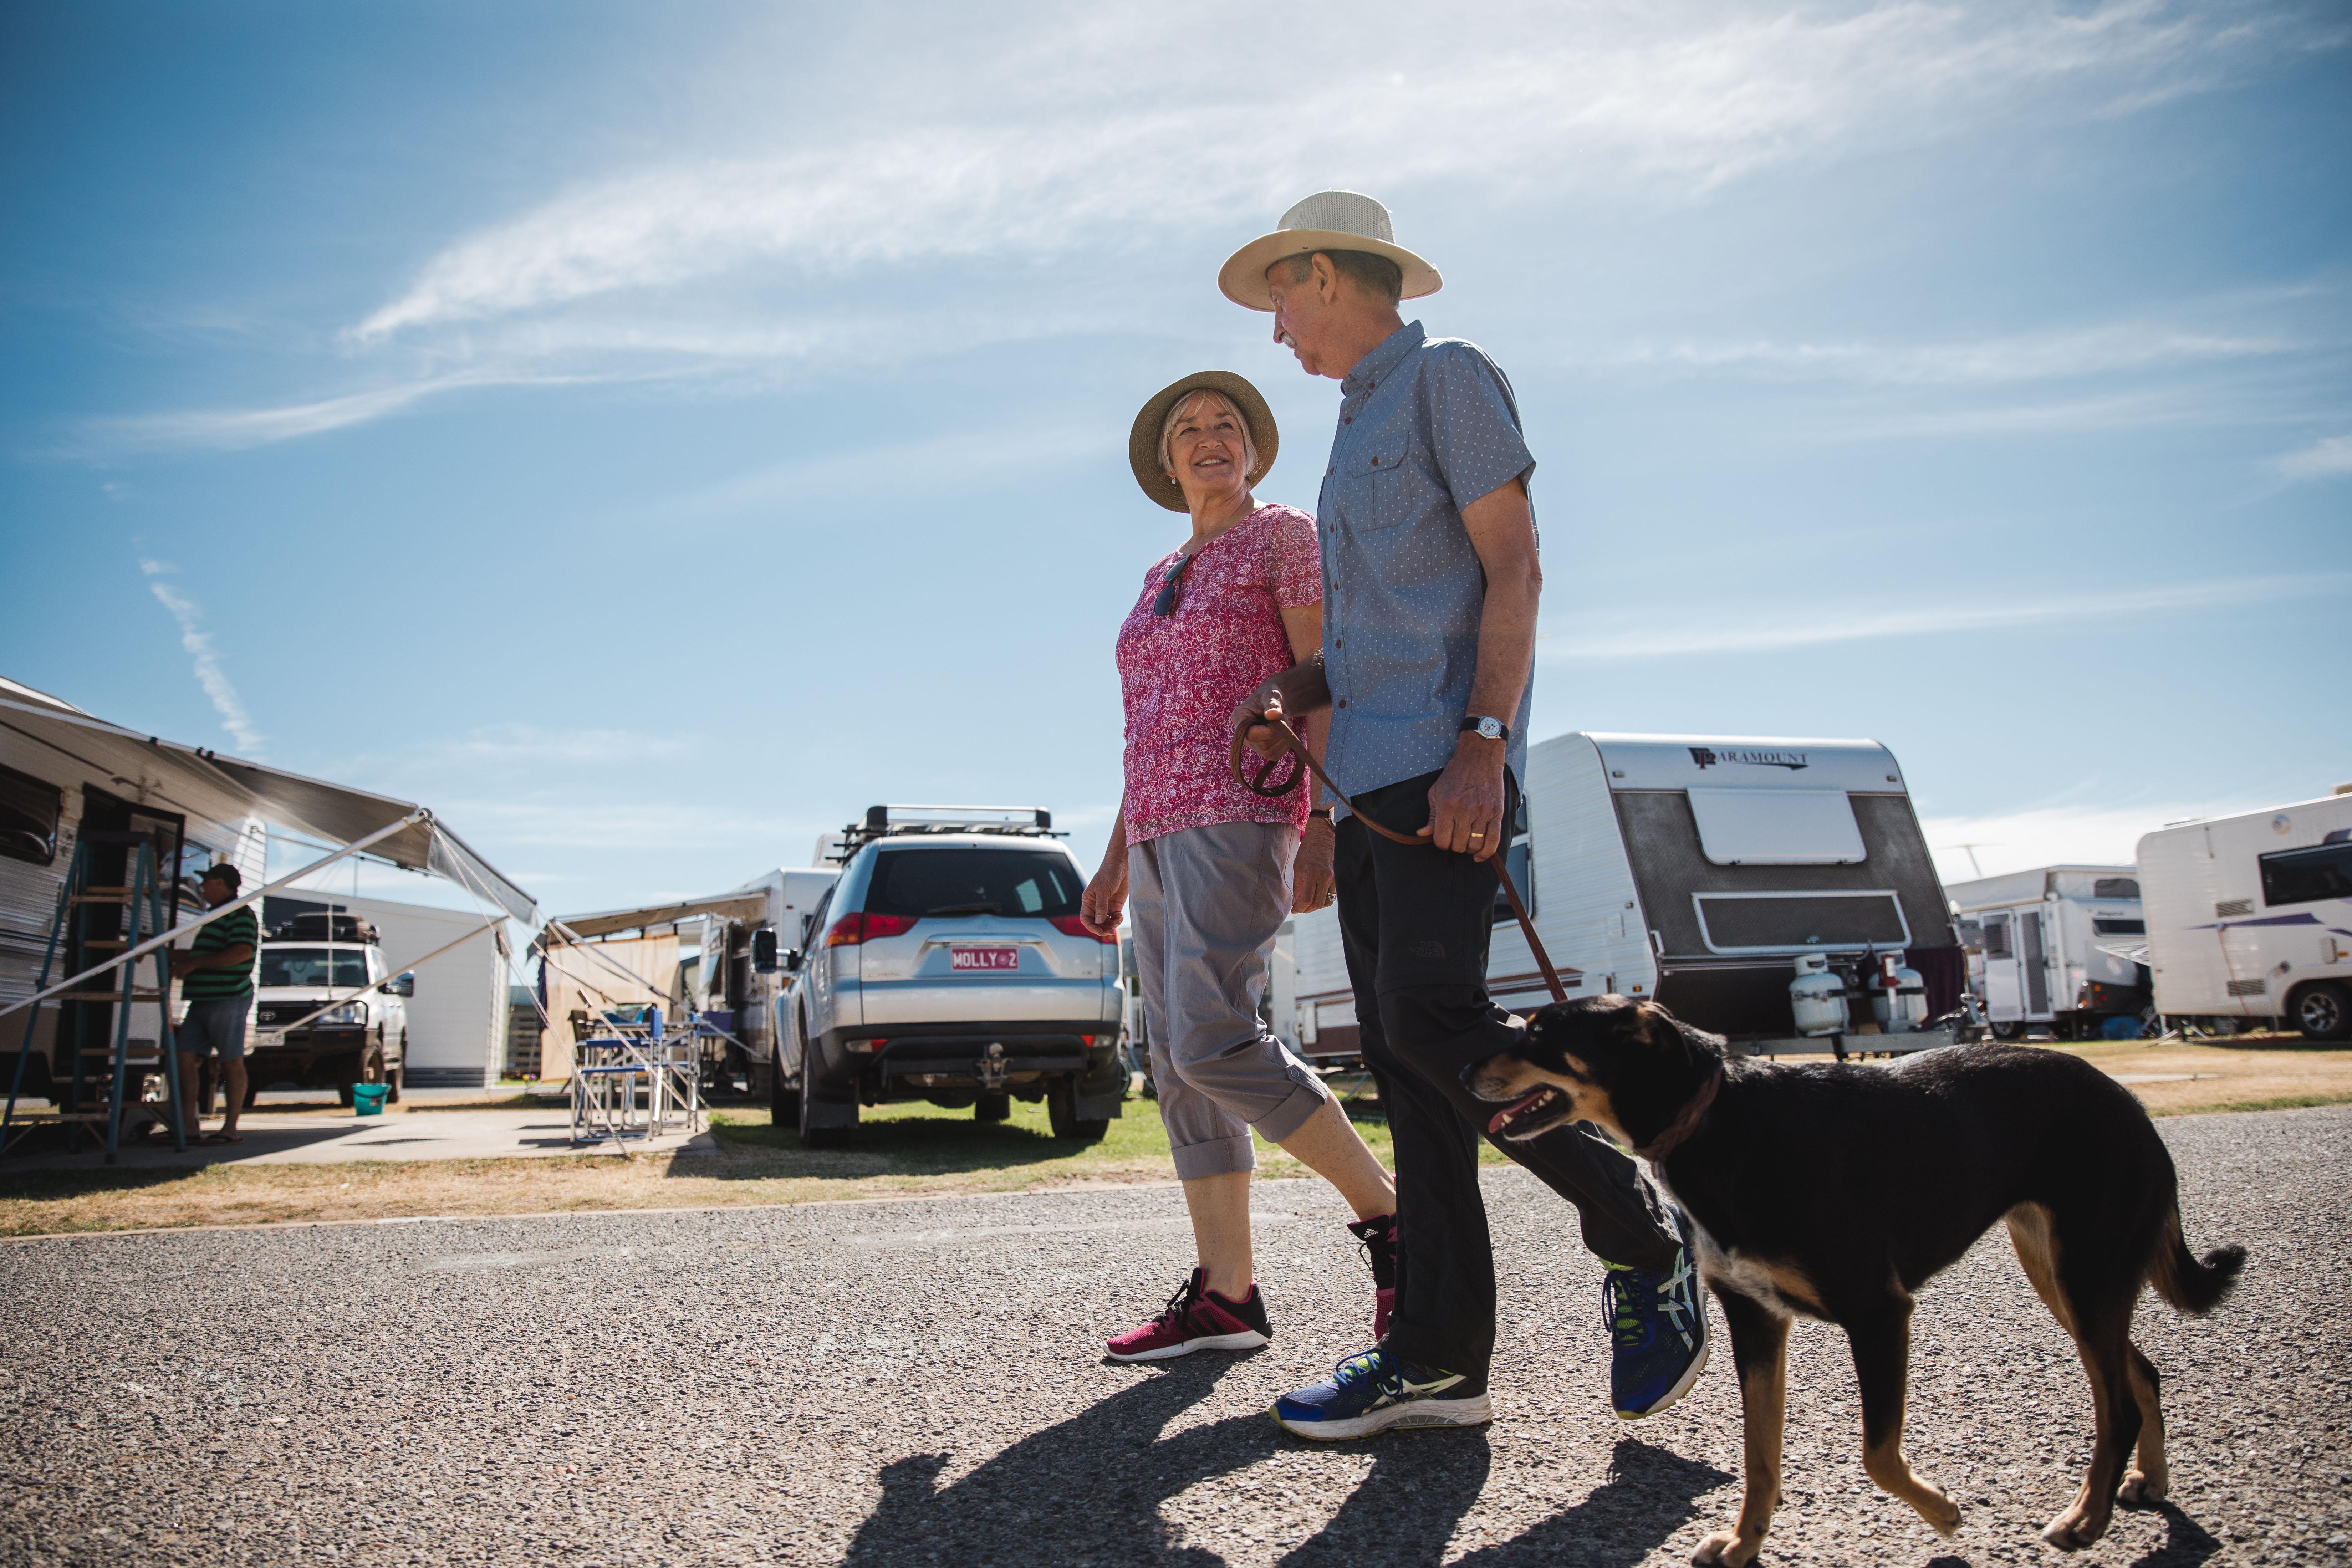 Dog Friendly Caravan Parks Broome